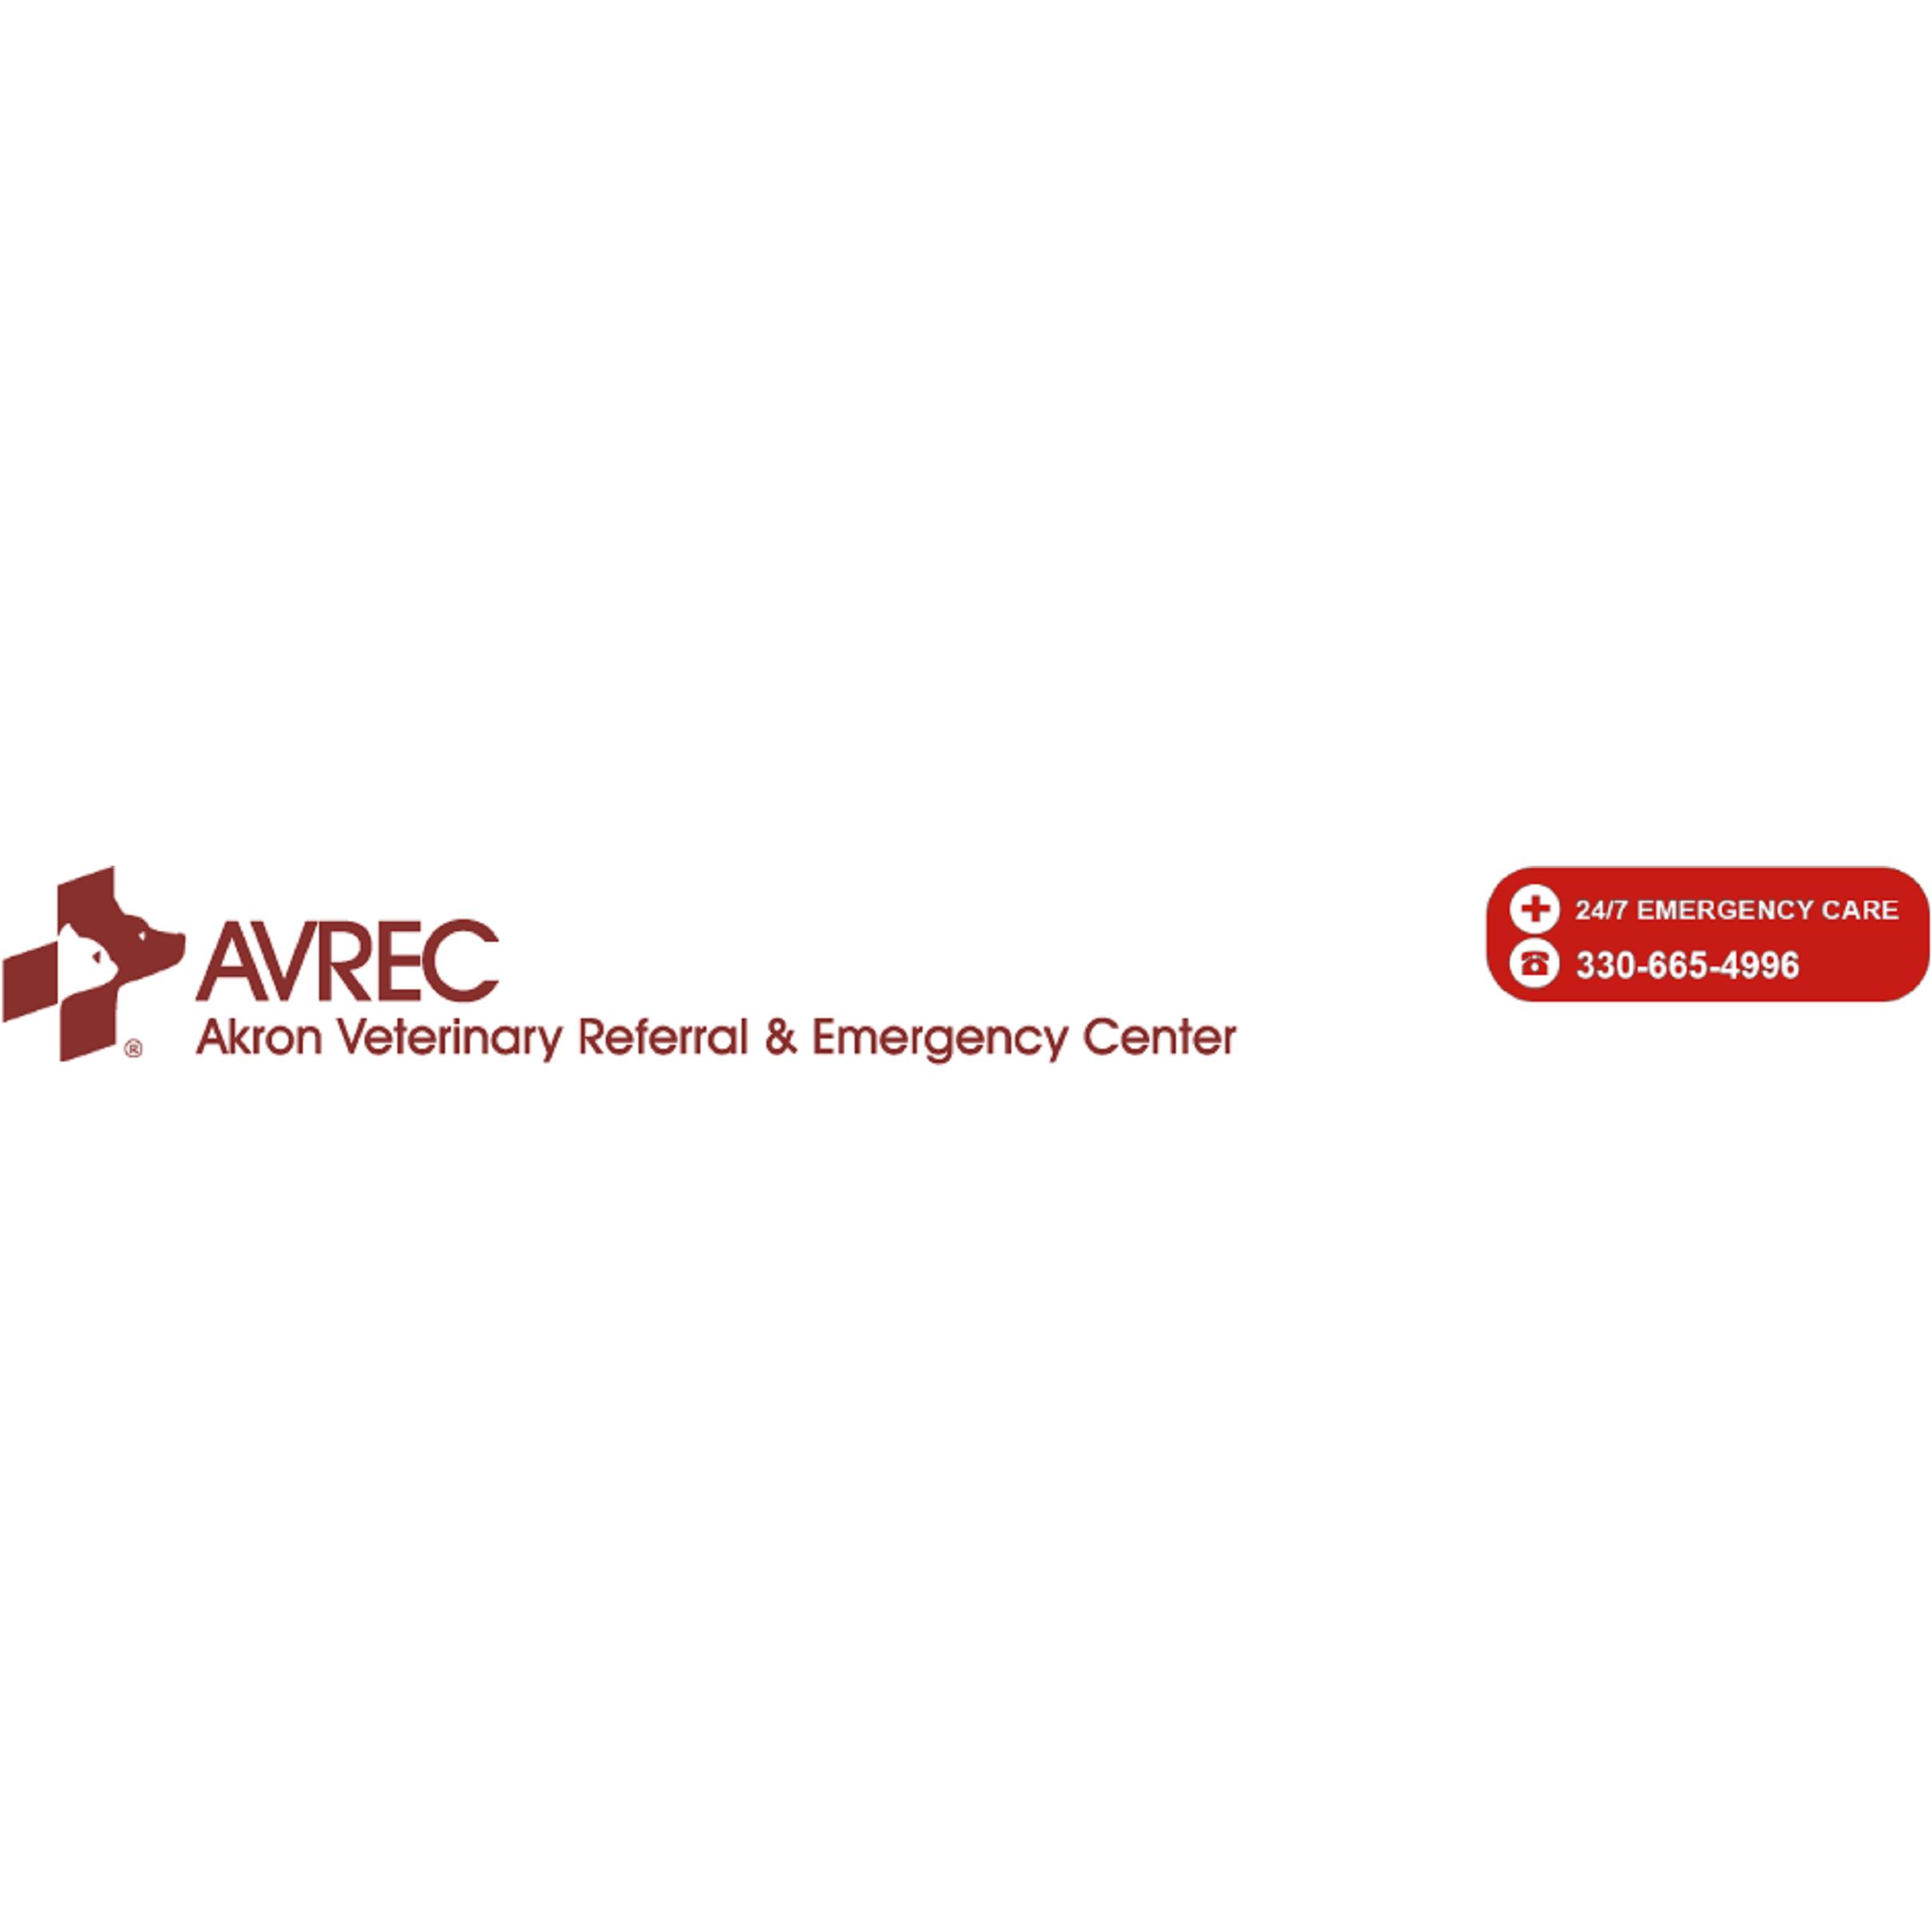 Akron Veterinary Referral & Emergency Center